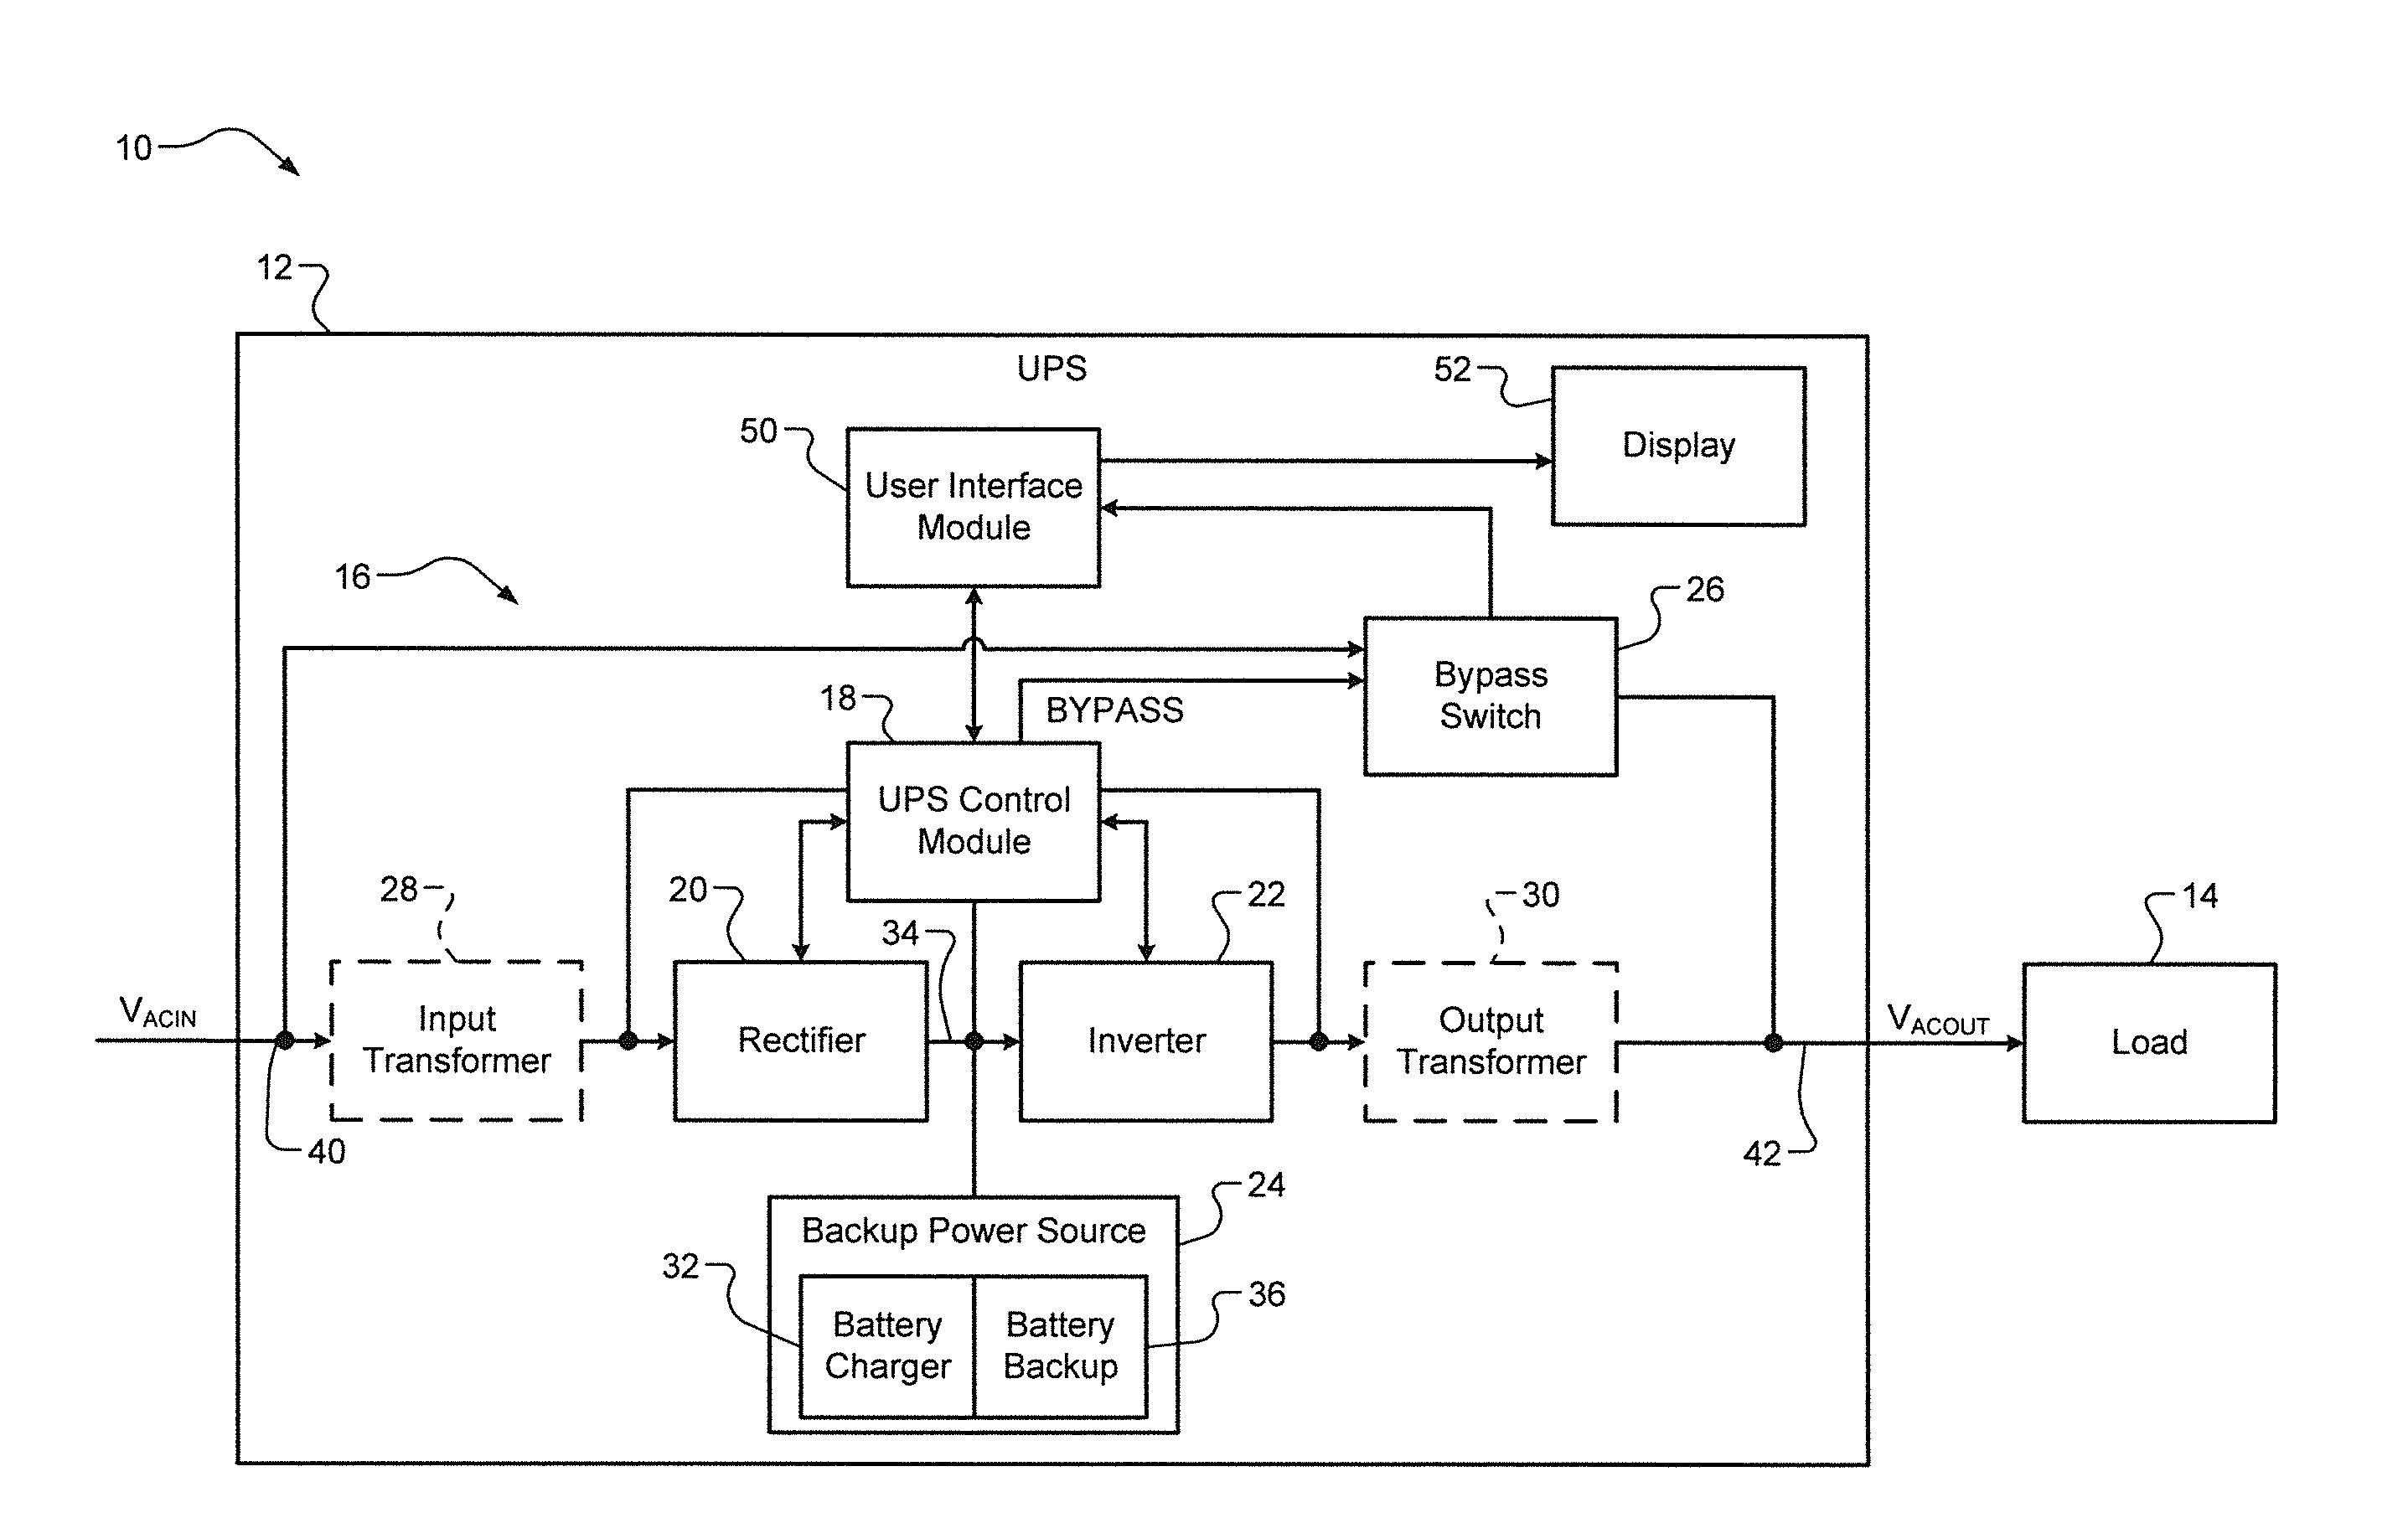 Ups transformer wiring diagram wiring data apc 20kva 208v wiring diagram wiring diagram database honeywell thermostat wiring diagram ups transformer wiring diagram asfbconference2016 Choice Image